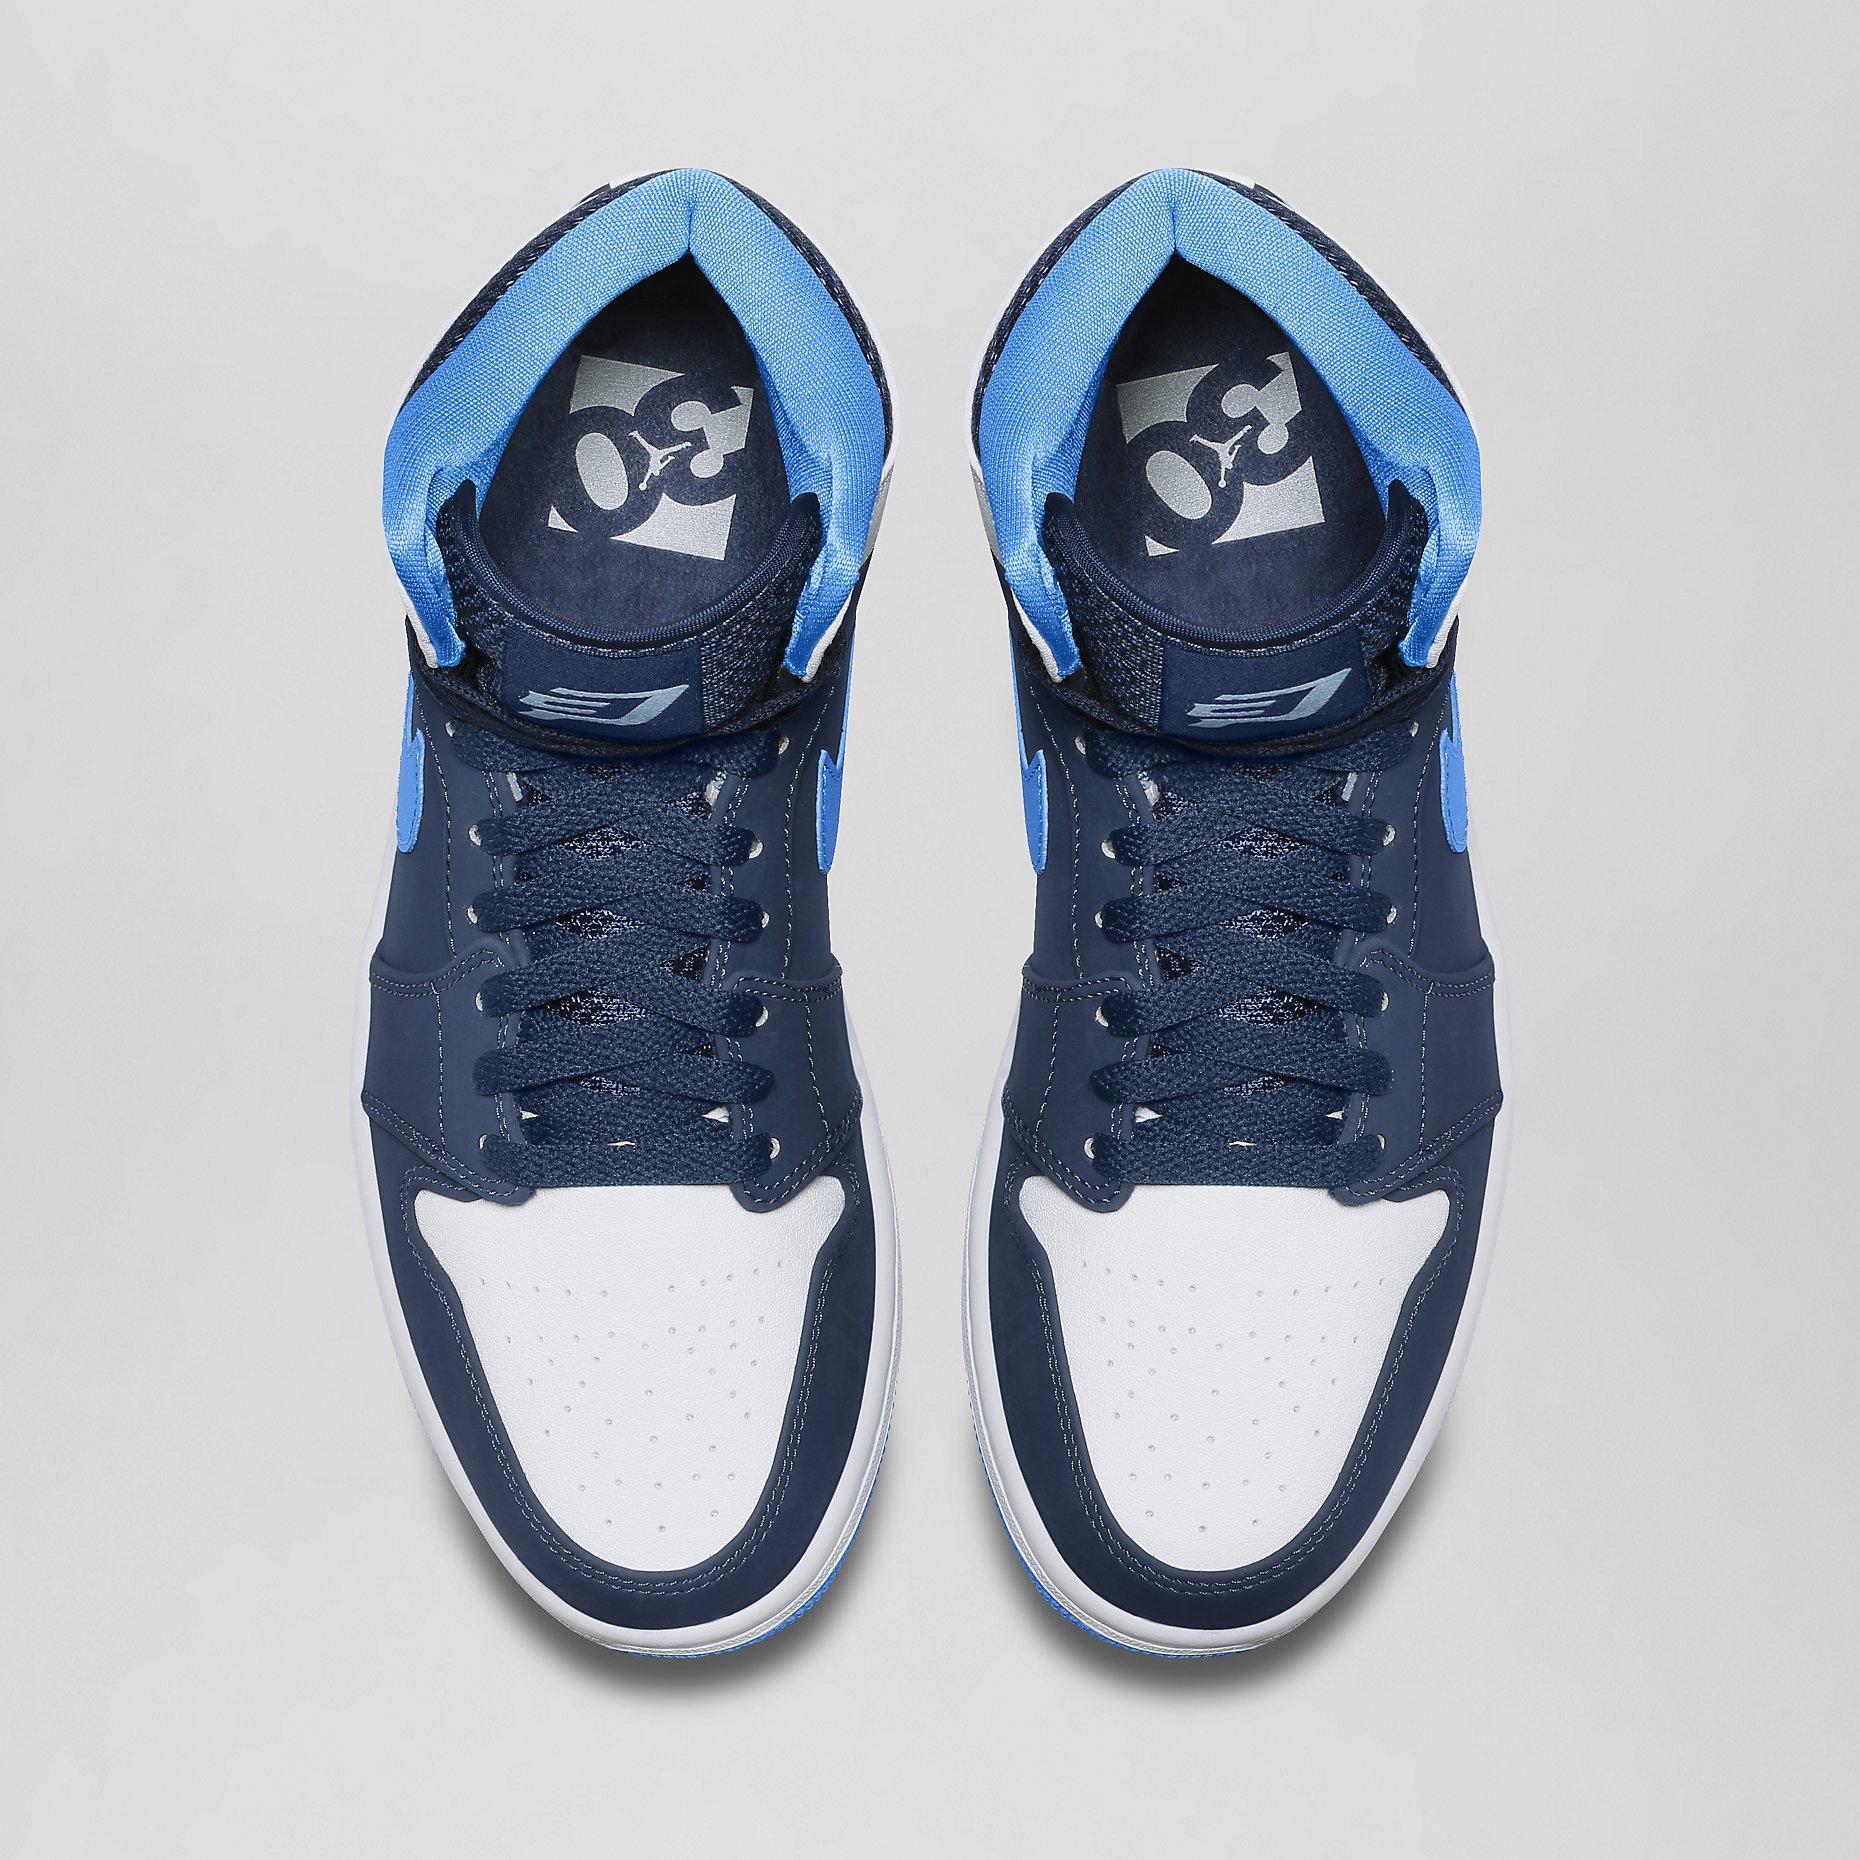 d5b27a6a2d7 Air Jordan 1 Retro High